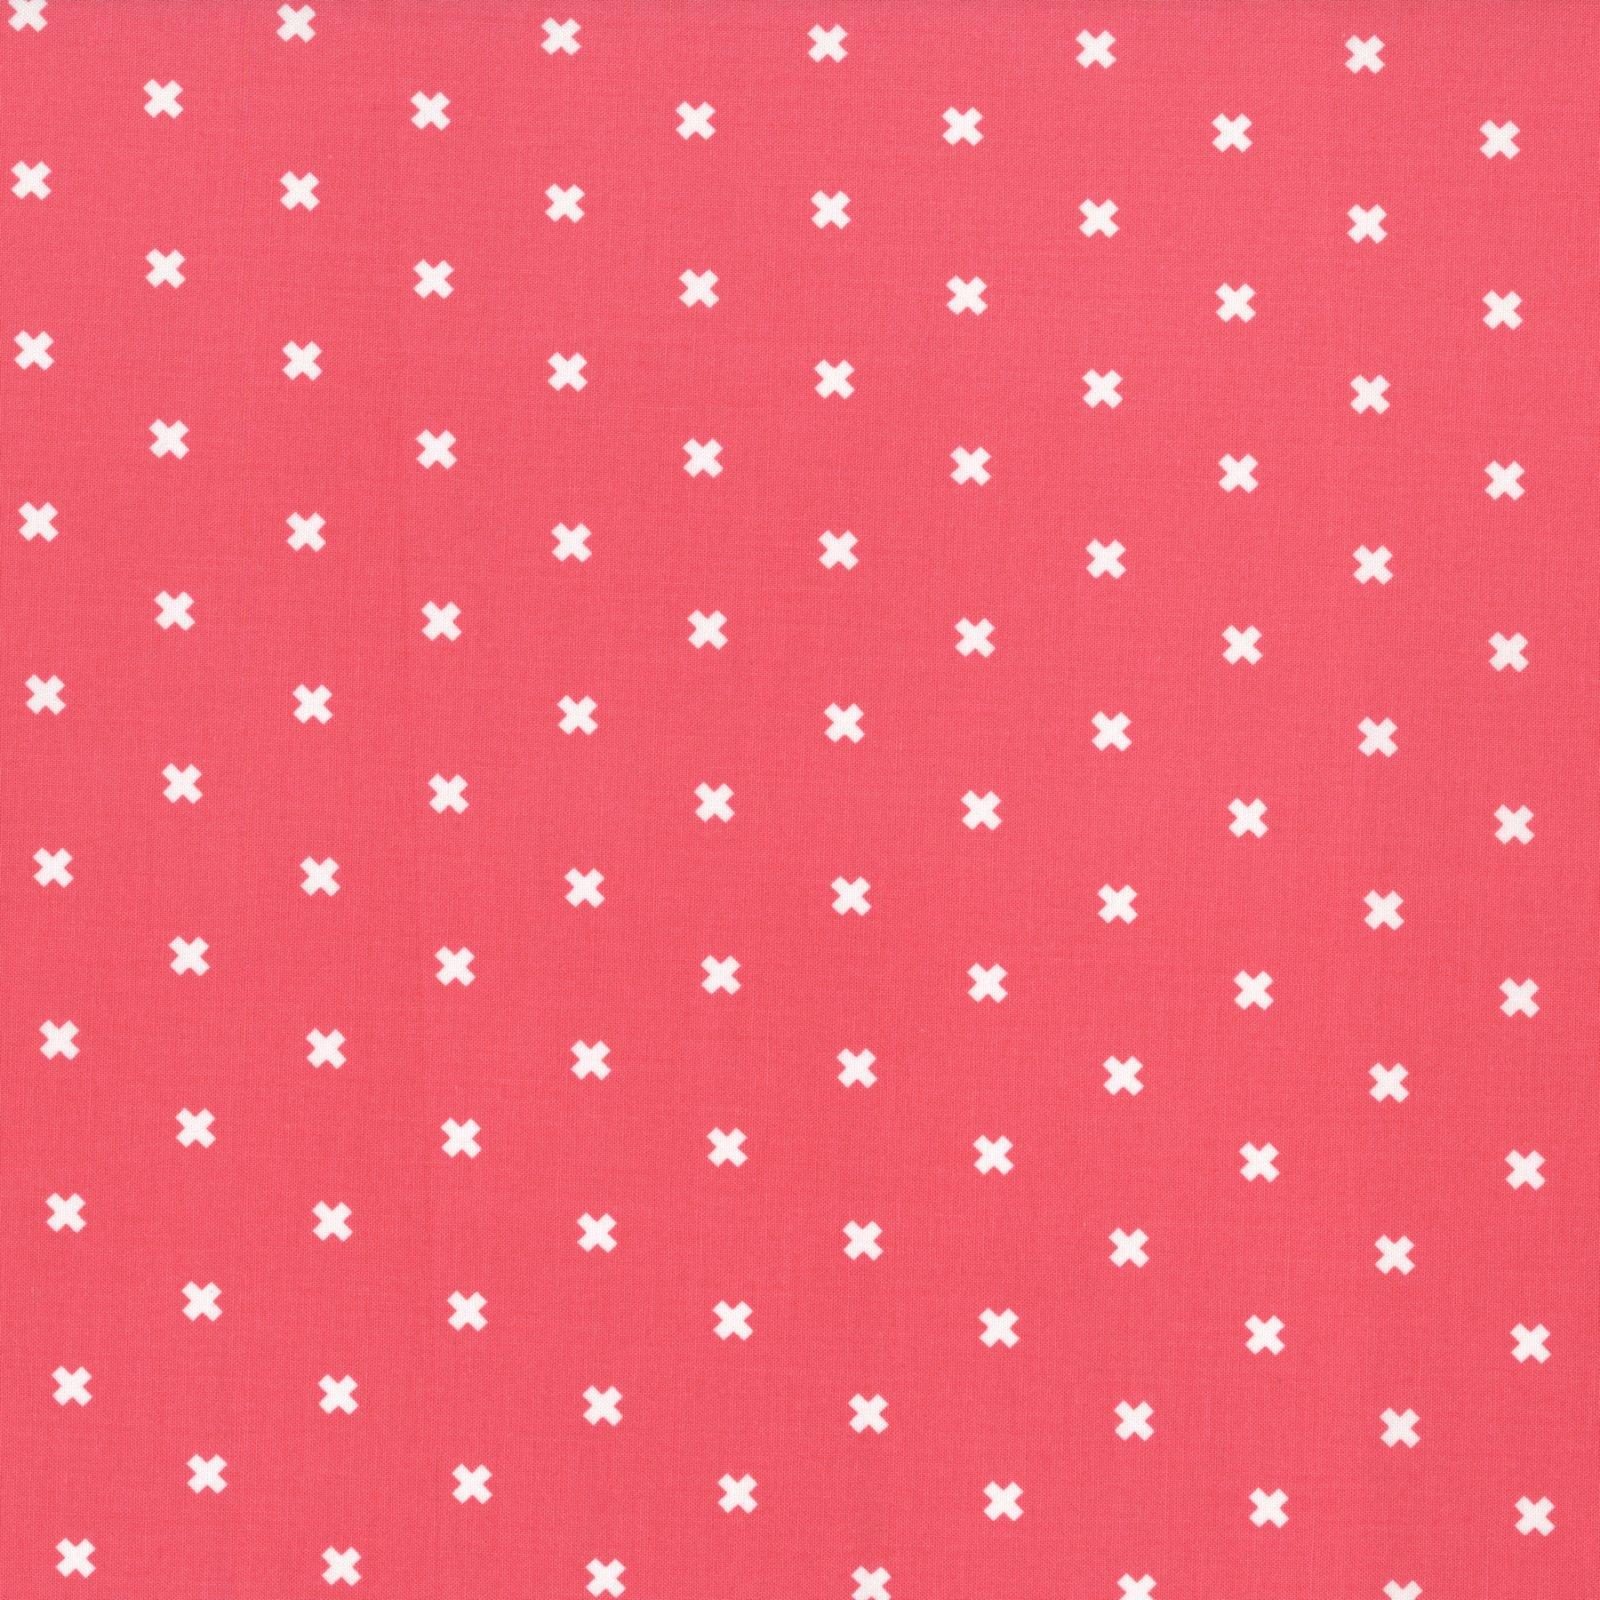 XOXO, Pink Cheeks, Cotton and Steel Basics